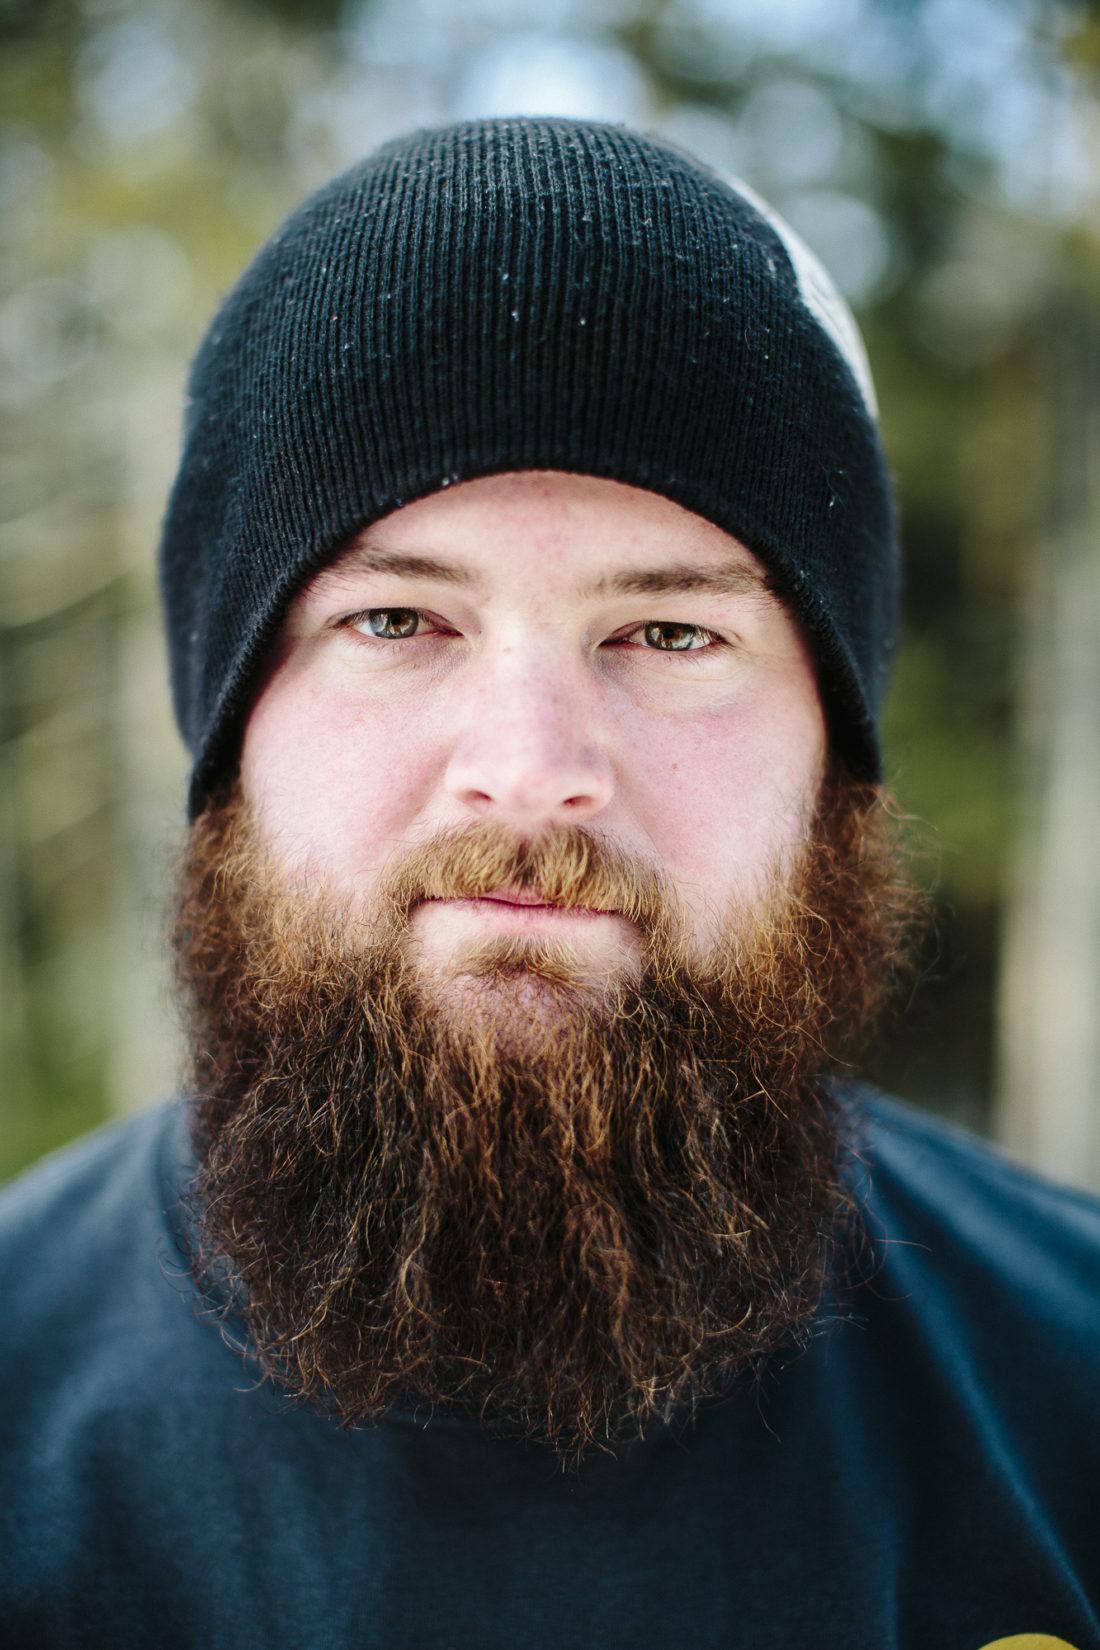 February 14, 2013 – Lyle Brooks, Vermont Farmer